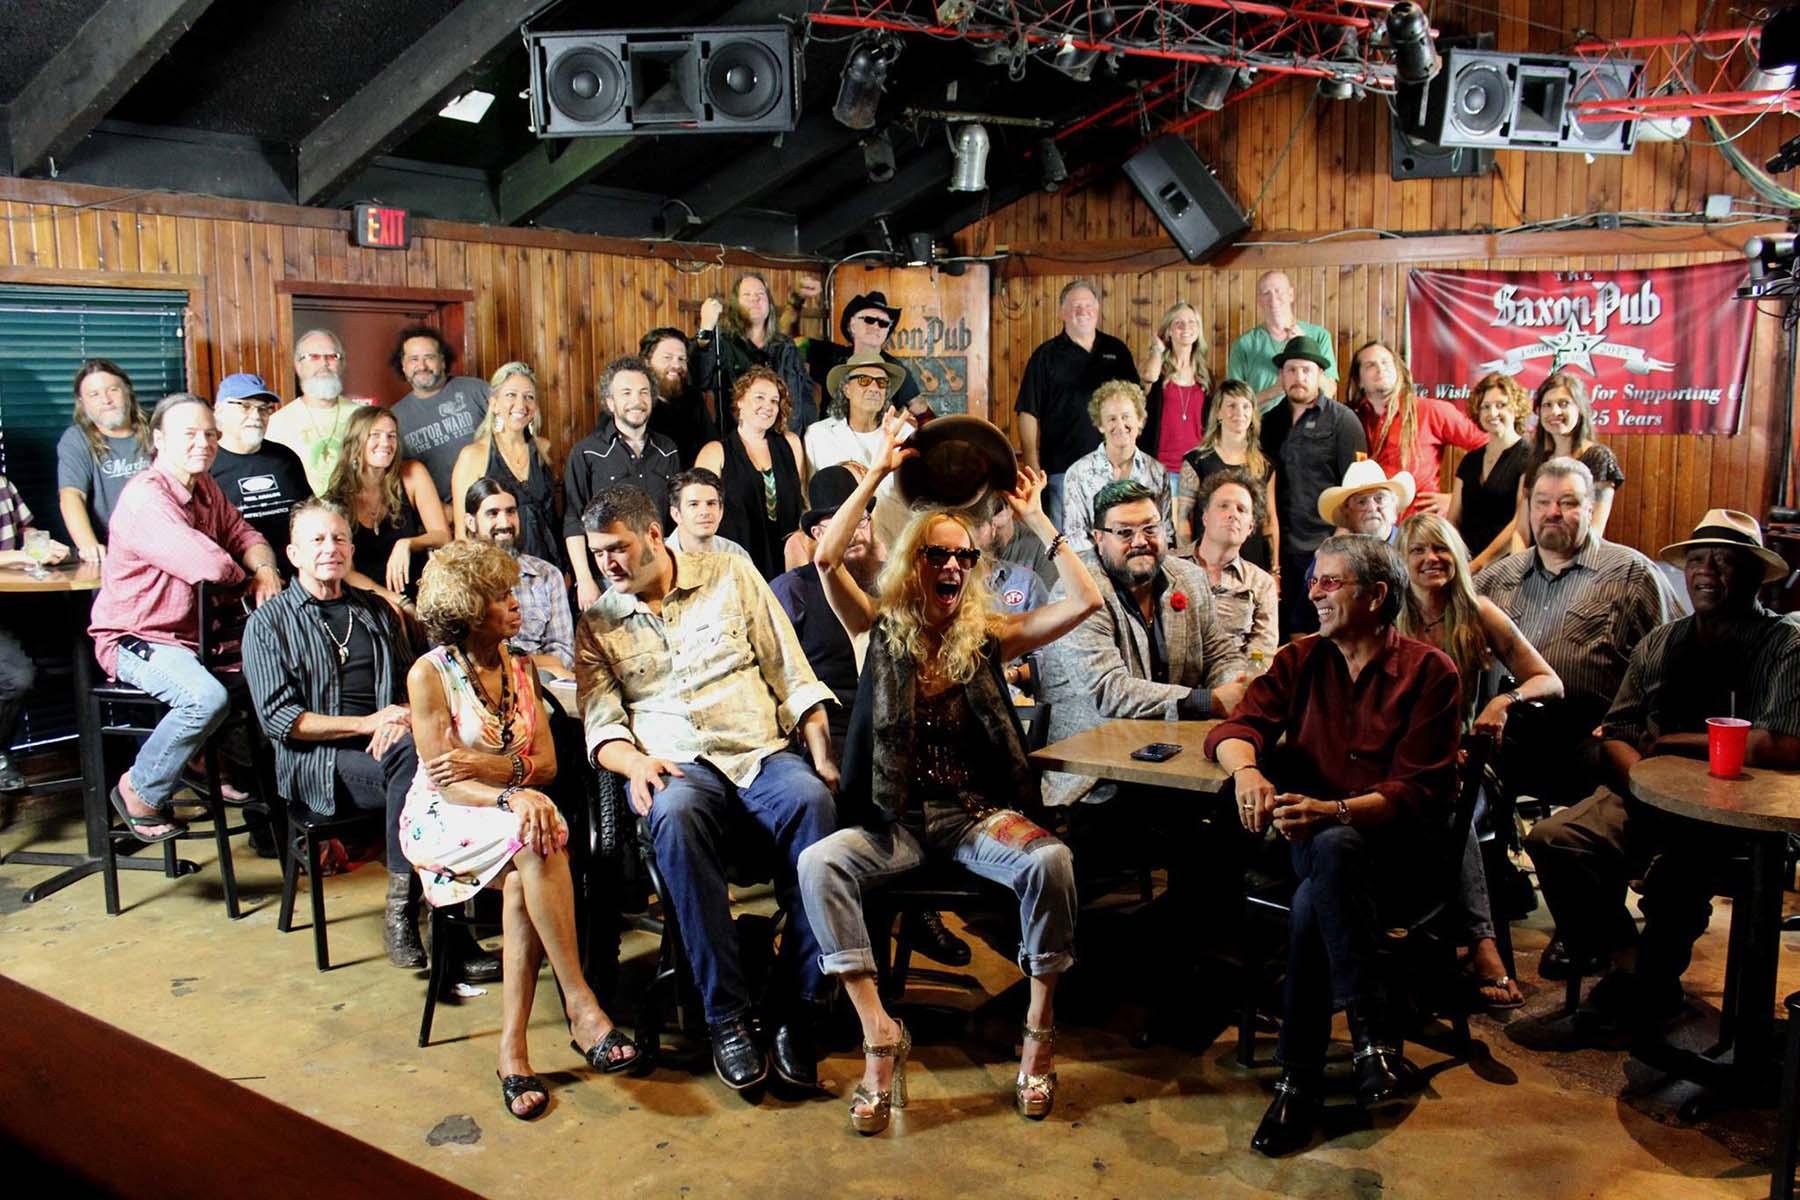 Saxon Pub reunion photo used with permission by Joe Ables - Saxon Pub